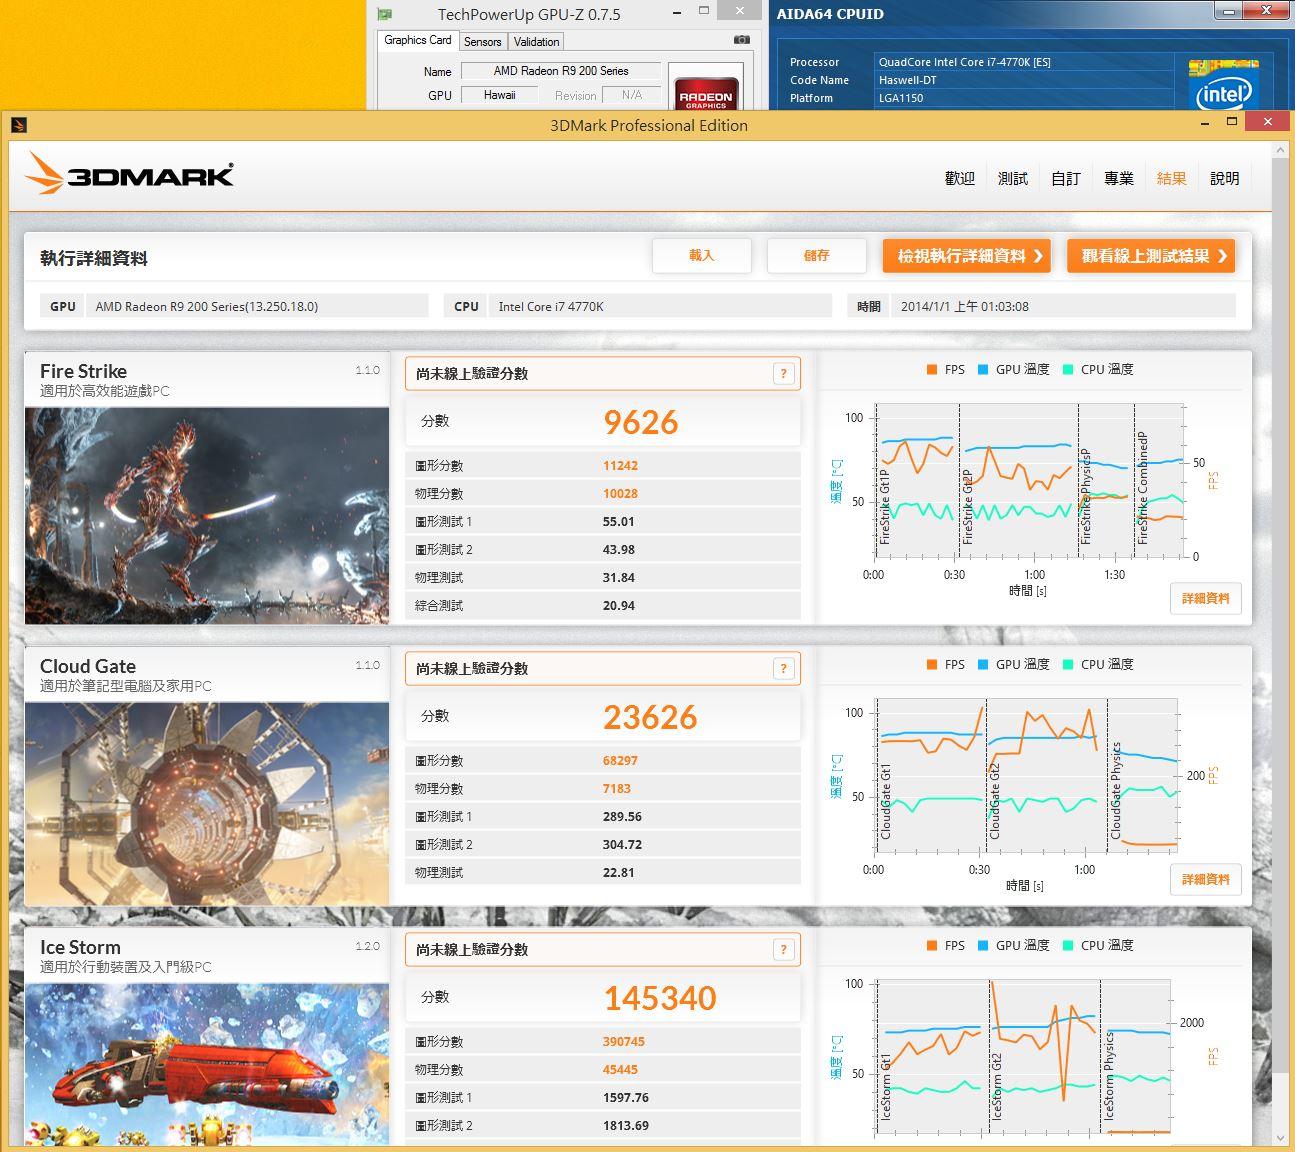 [XF] 給力高時脈 掠奪高效能 Kingston HyperX Predator 2800 8G 評測